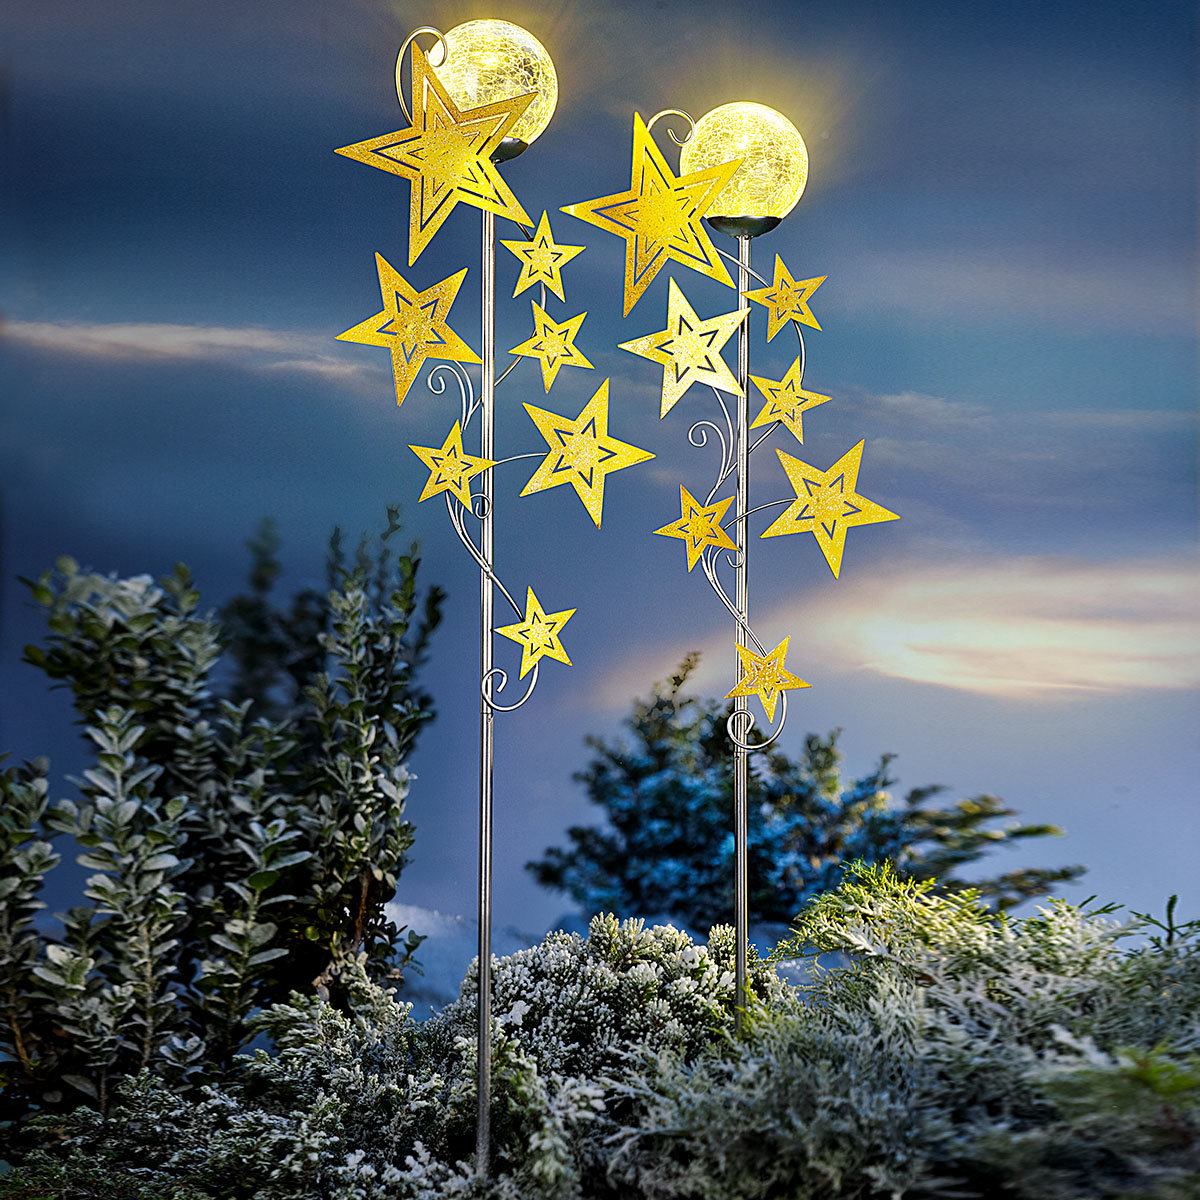 LED-Gartenstecker Sternenschweif, 2er-Set